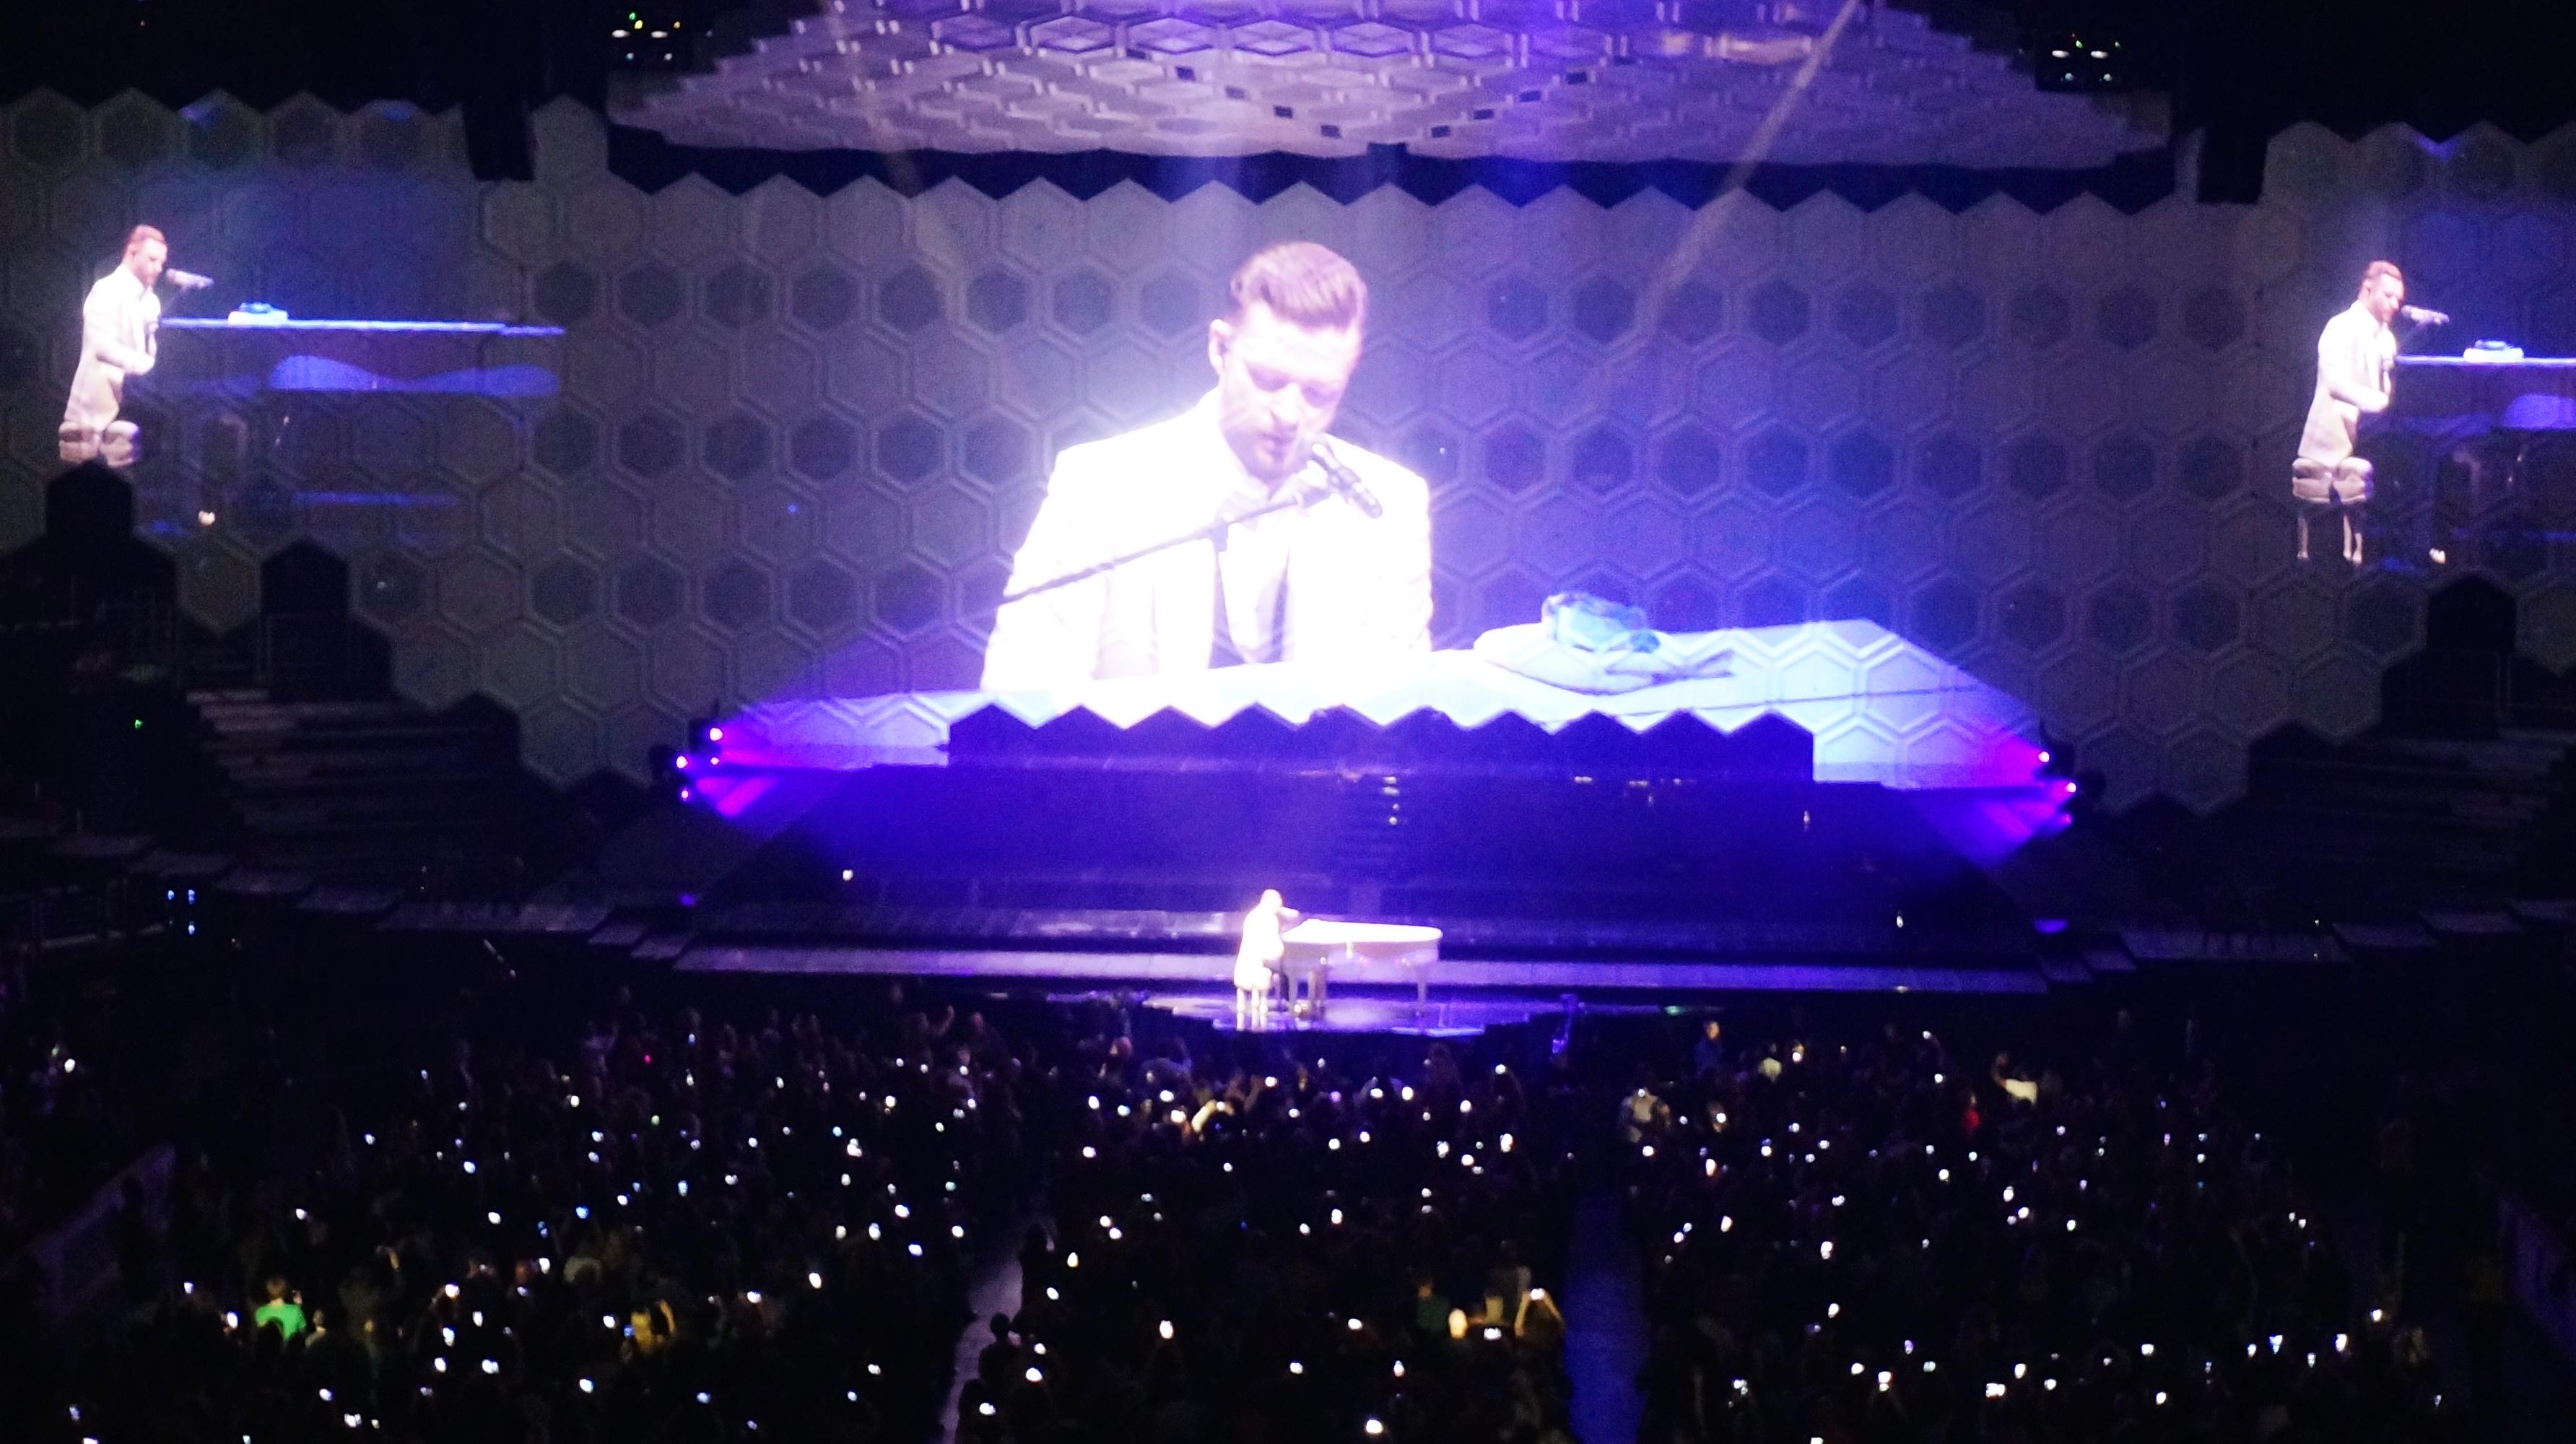 Justin Timberlake 2020 Tour File:Justin Timberlake   The 2020 Experience World Tour